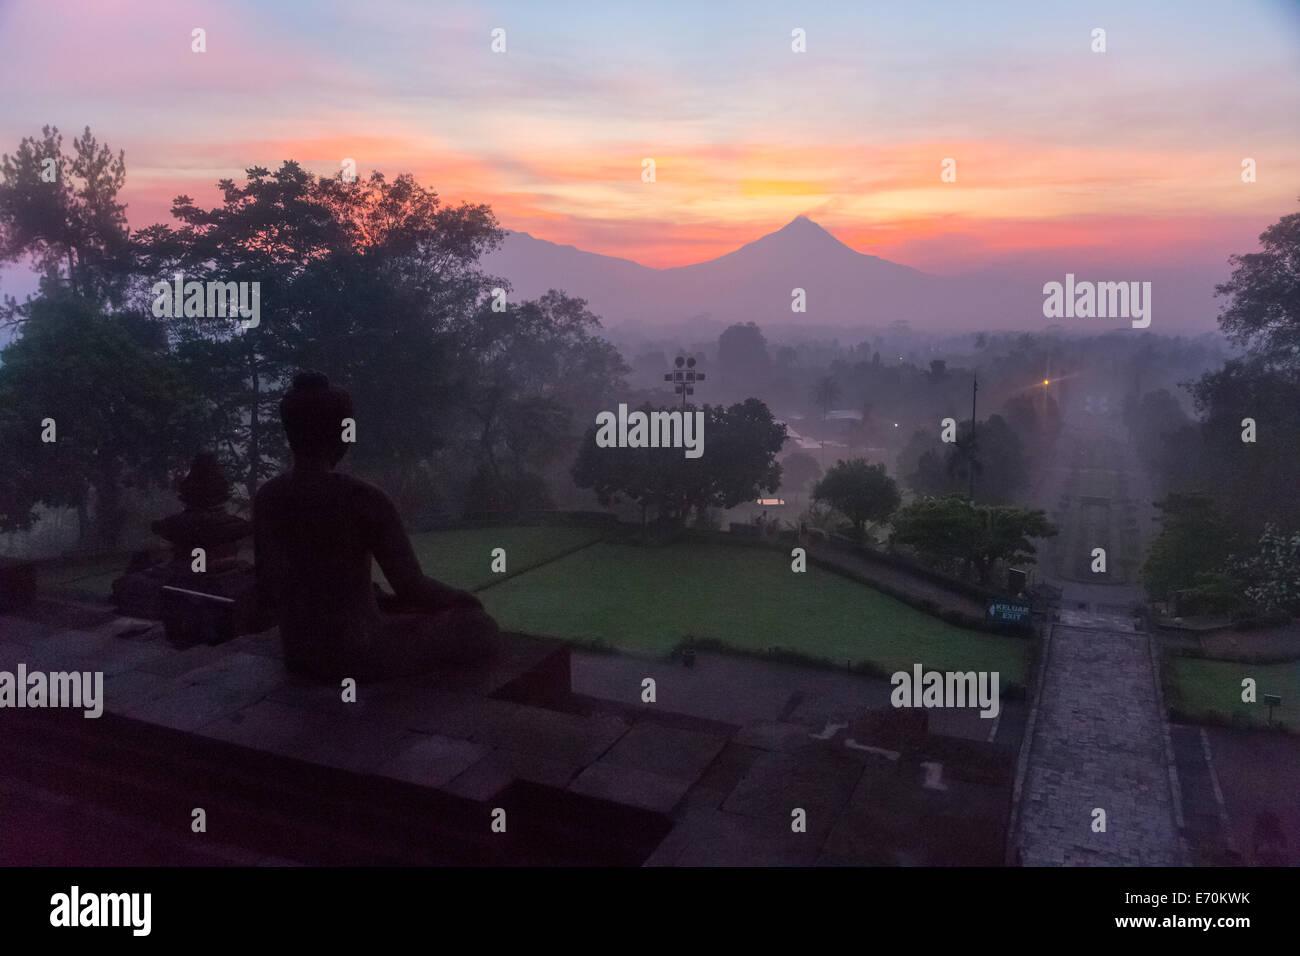 Borobudur, Java, Indonesia.  Buddha Statue and Mount Merapi at Sunrise in Morning Mist. - Stock Image